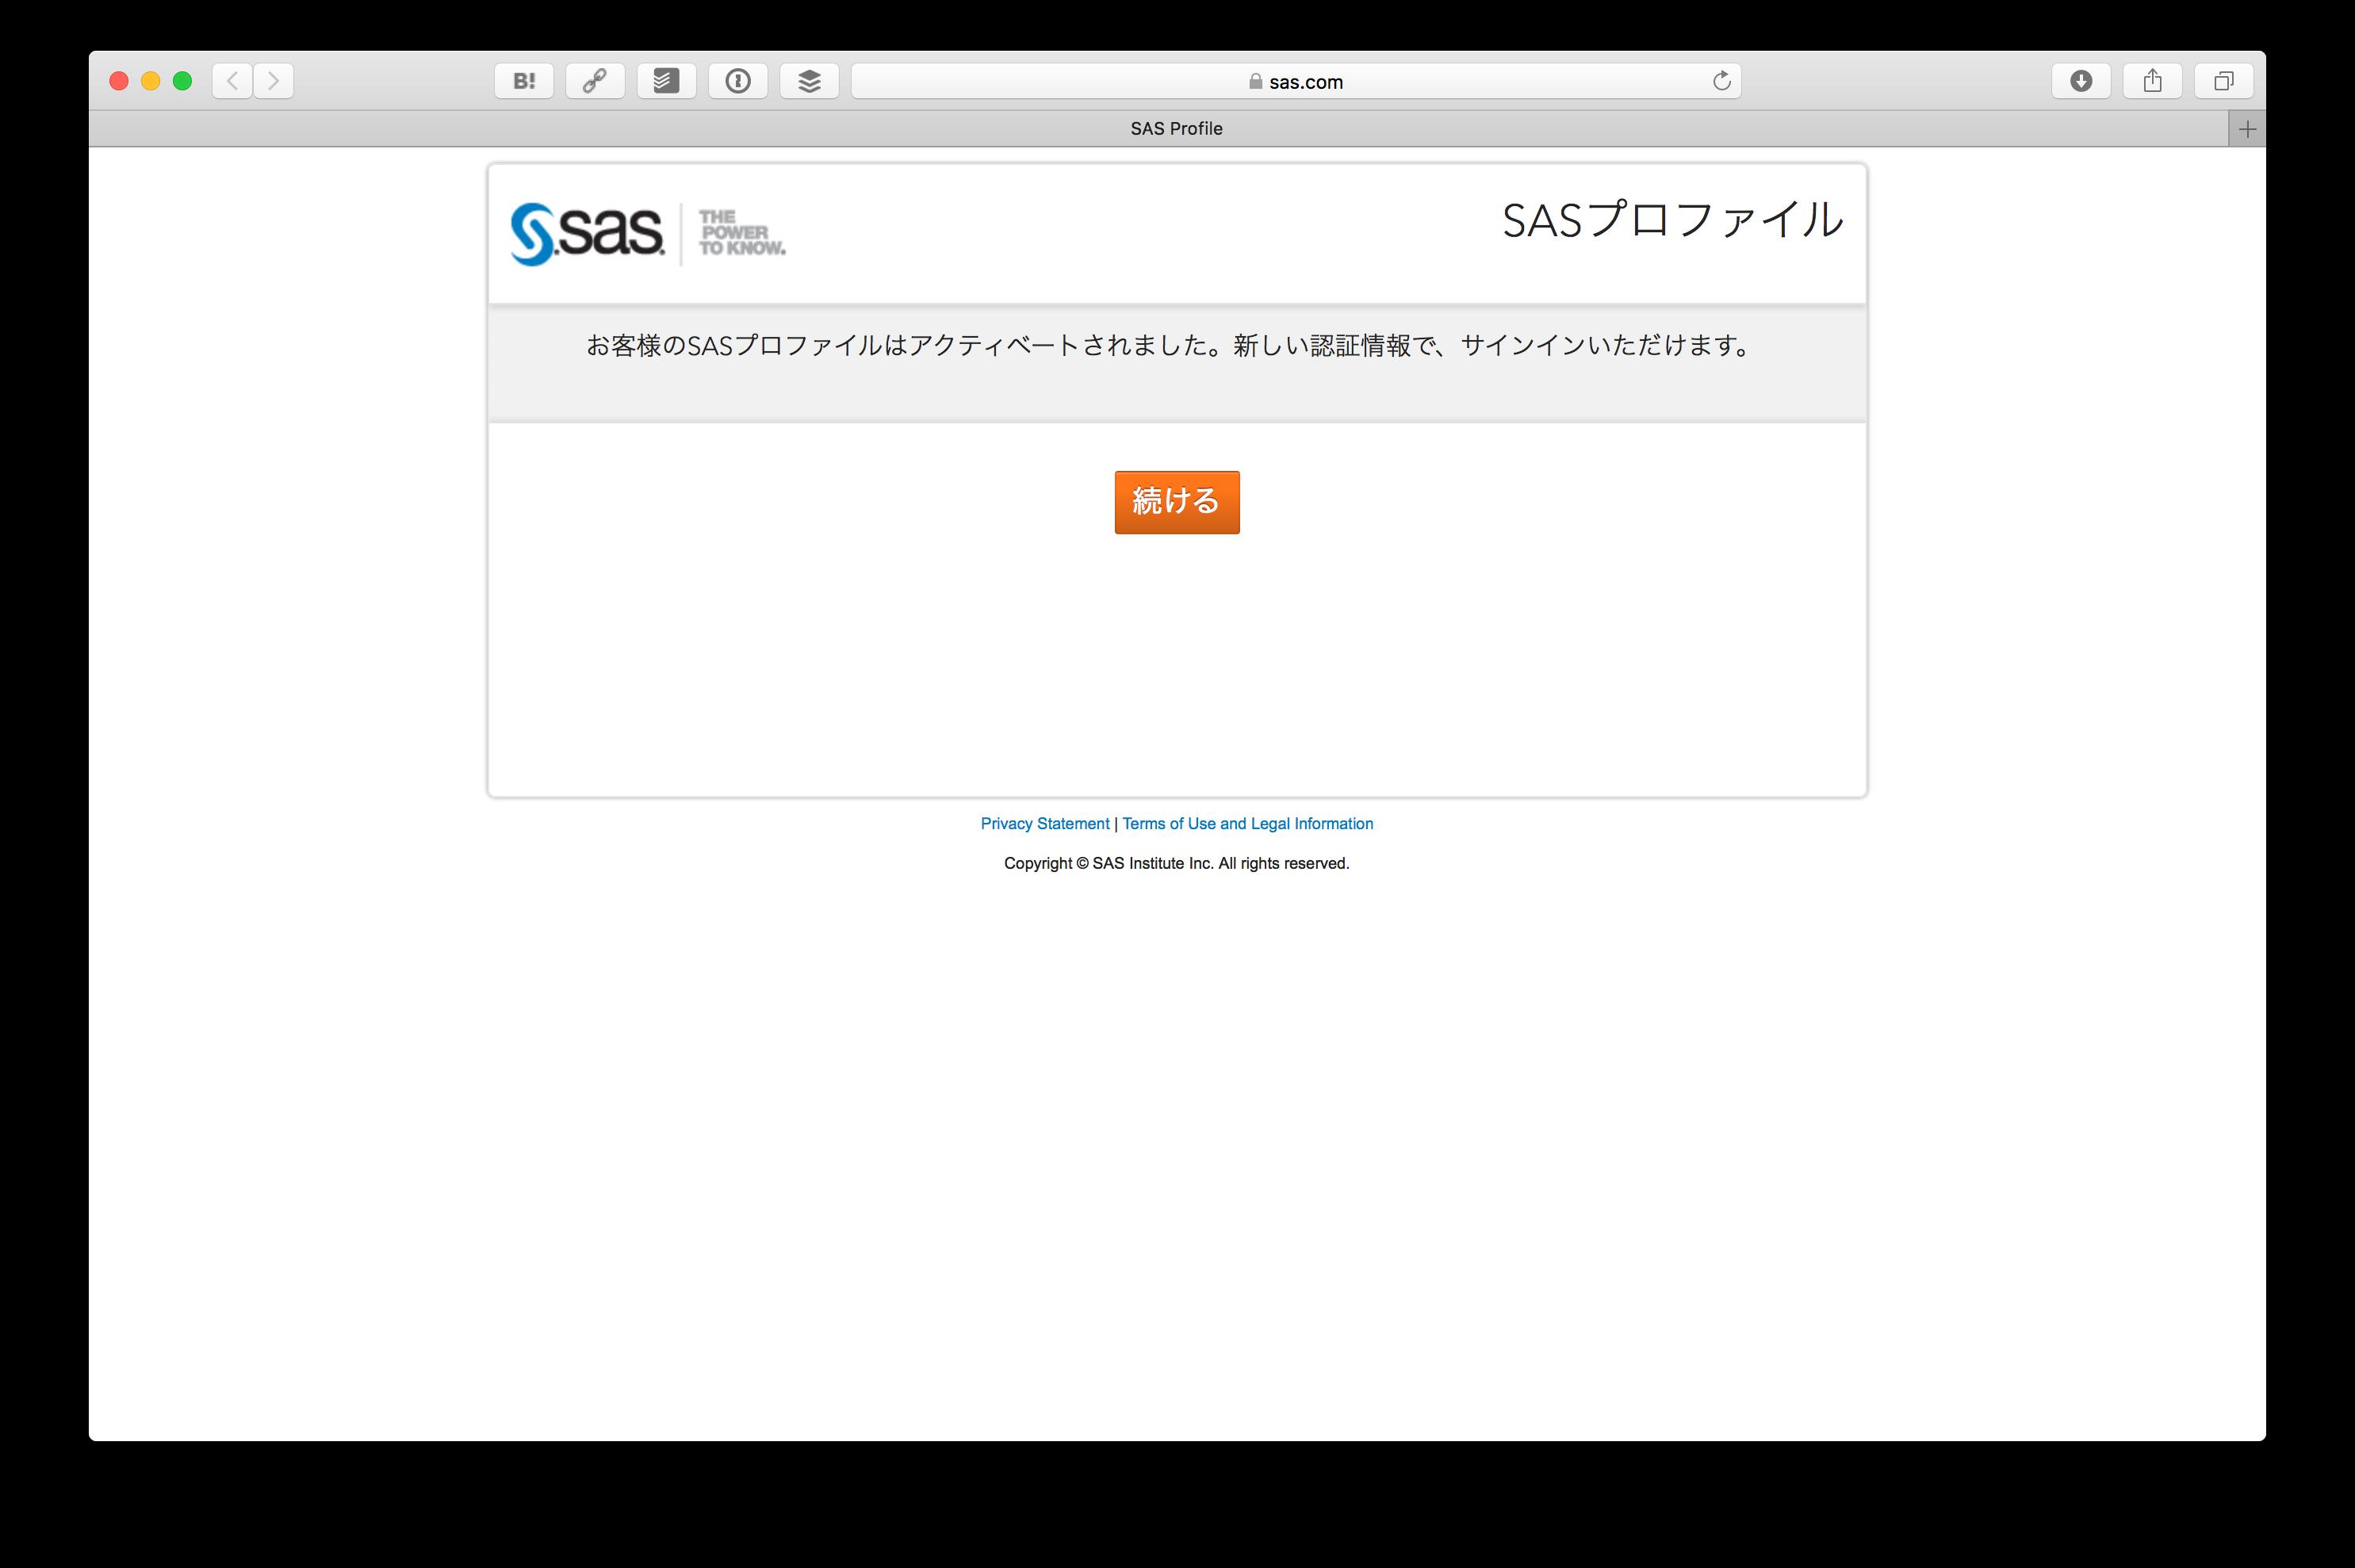 Screenshot_ 2018-06-27 15.09.03.png